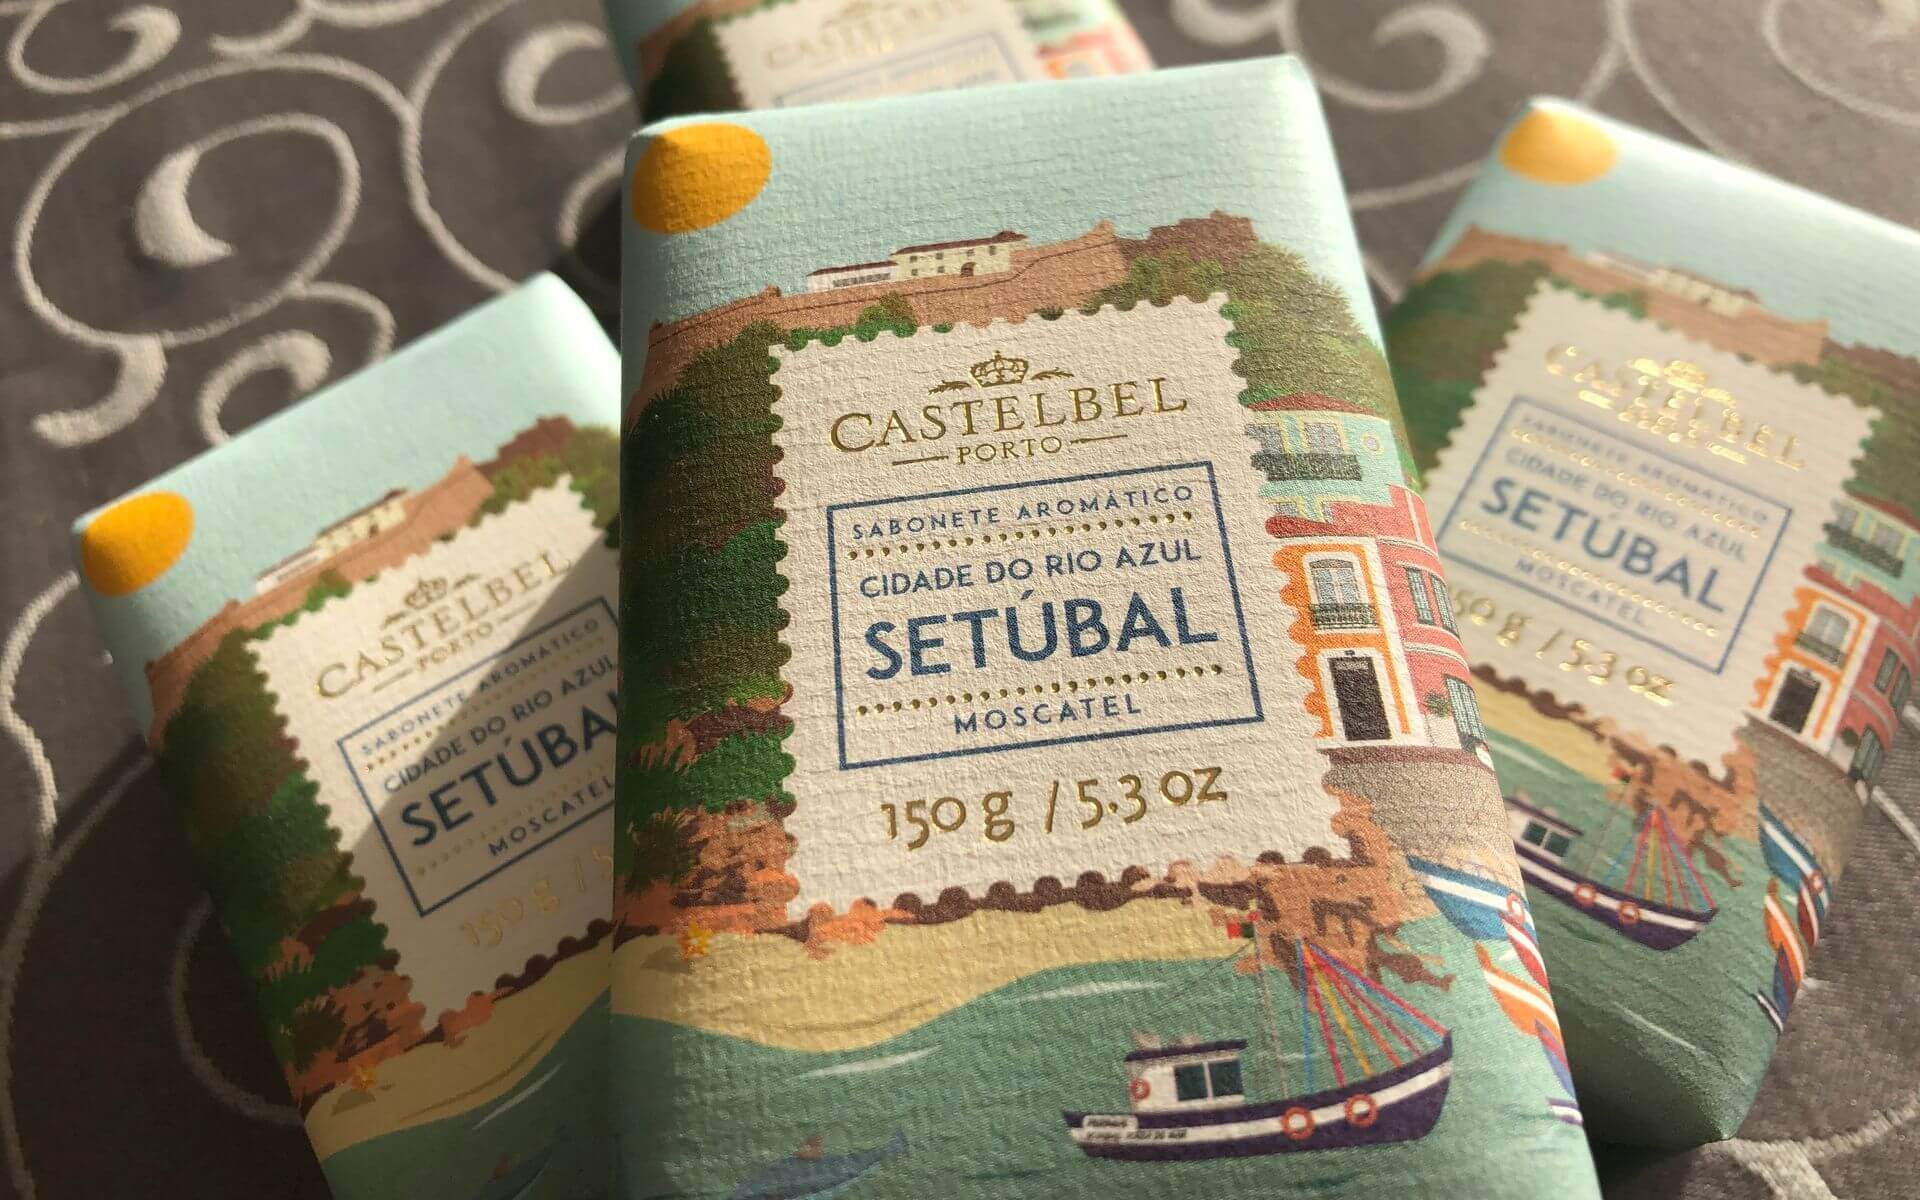 Sabonete Castelbel Setubal